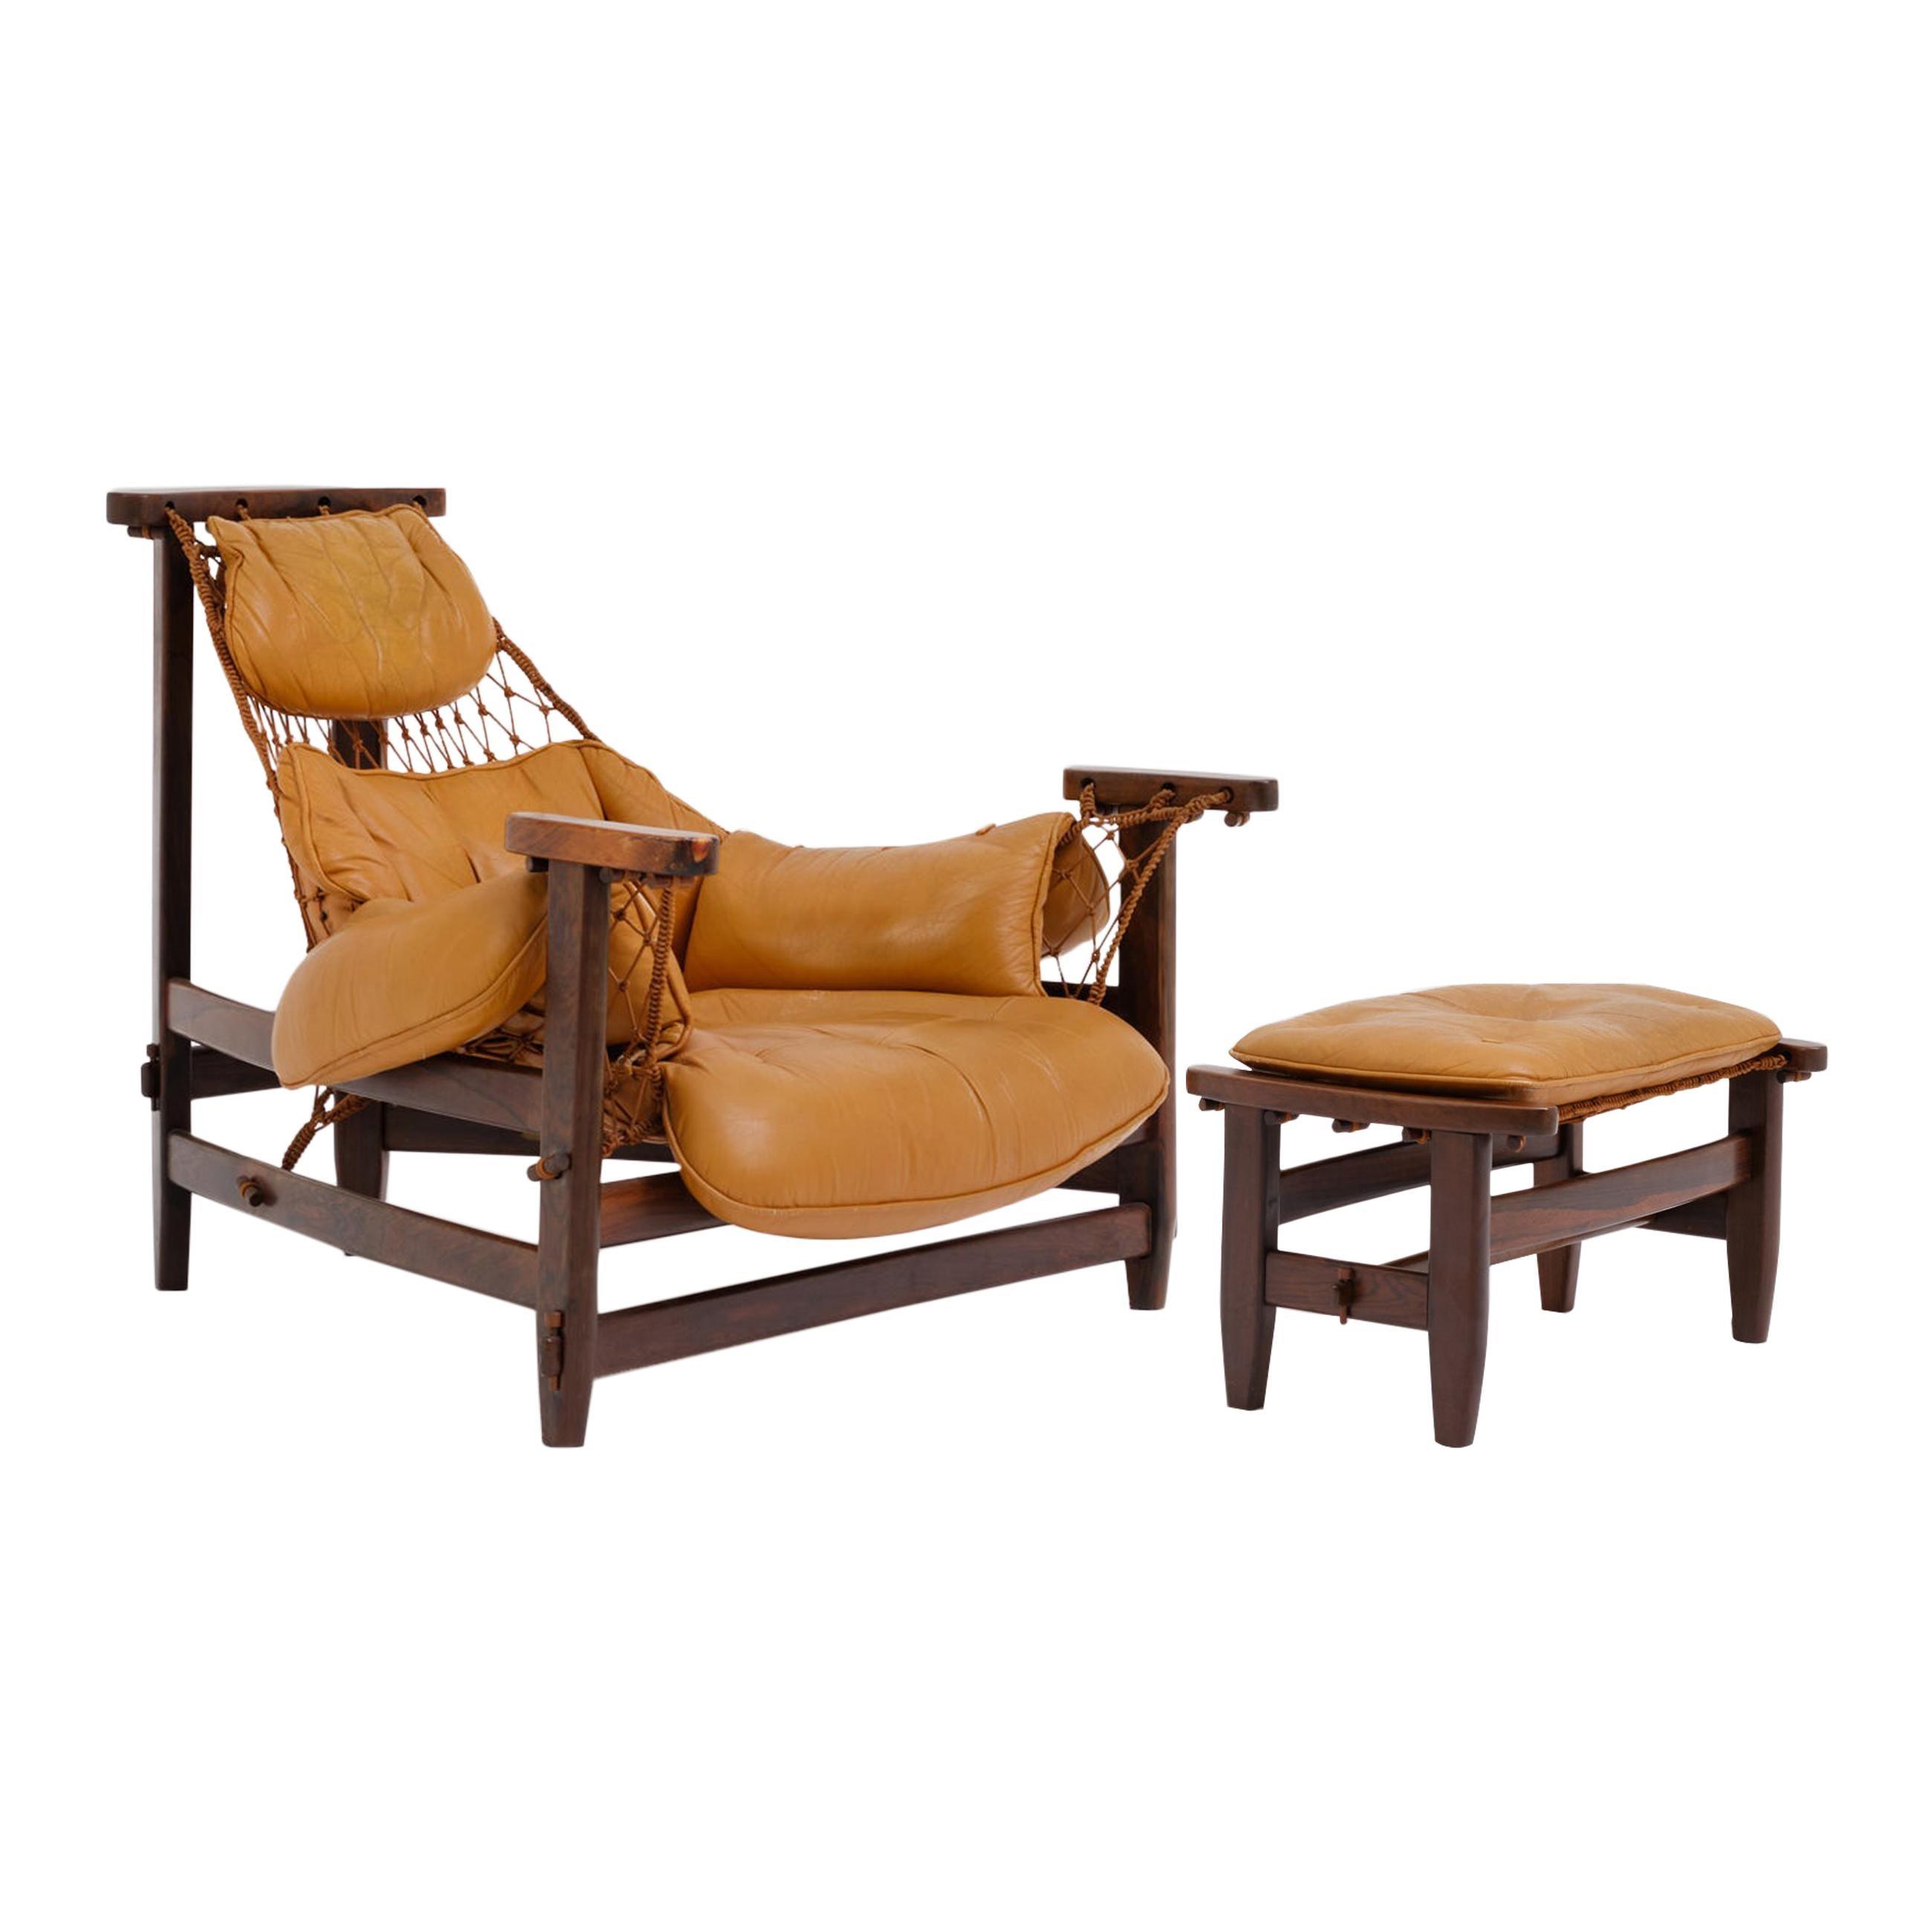 Brazilian Mid-Century Modern 'Jangada' Lounge Chair and Ottoman by Jean Gillon